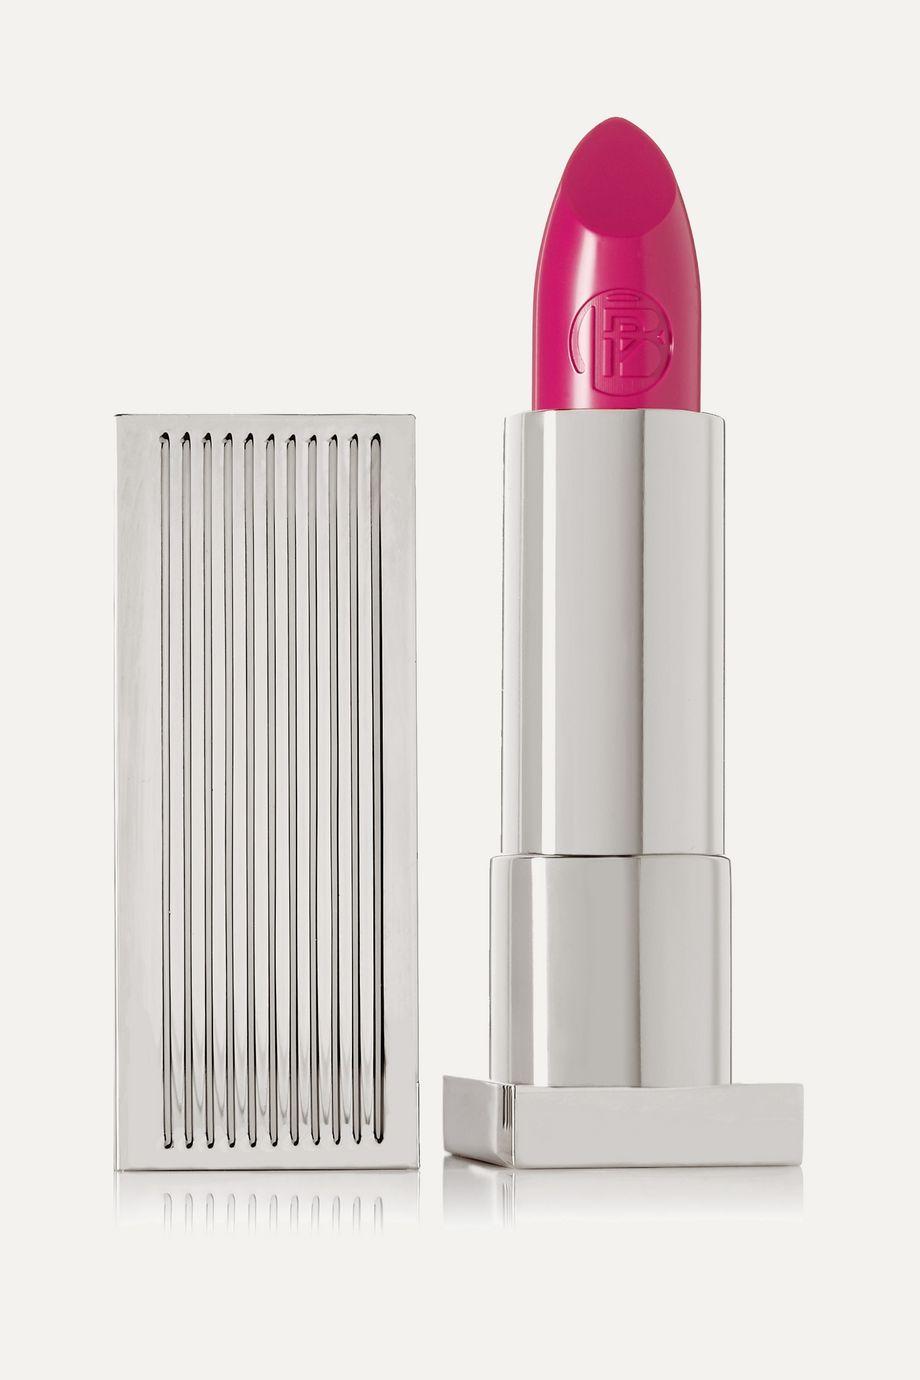 Lipstick Queen Silver Screen Lipstick - Play It